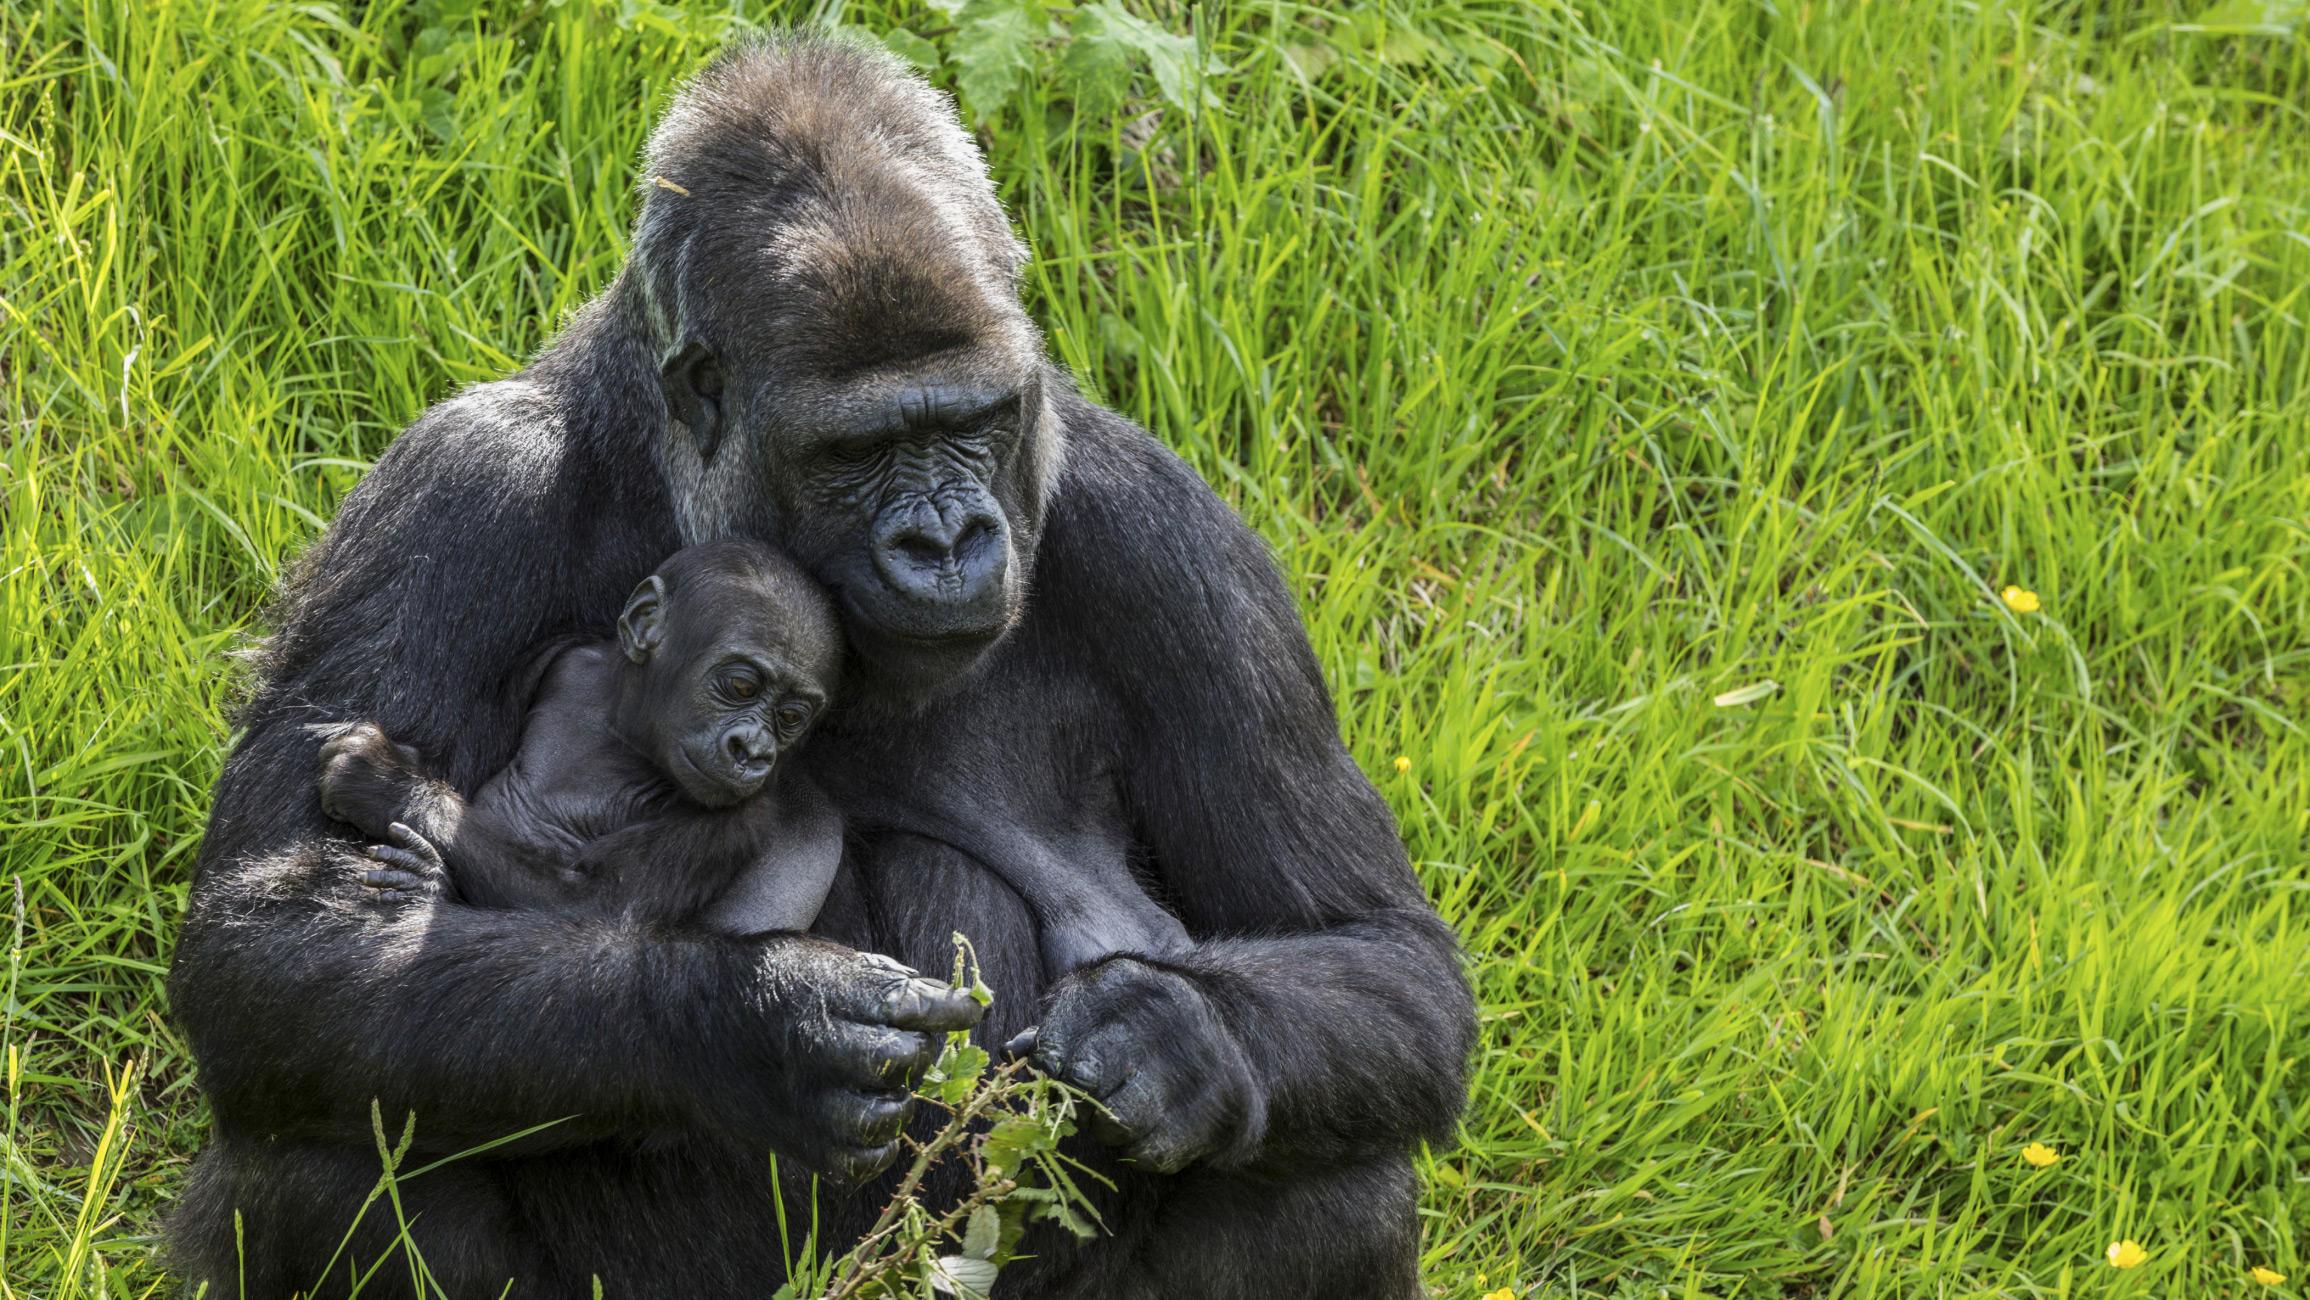 Top 10 Animals That Exhibit Human Behavioral Traits Animal Planet